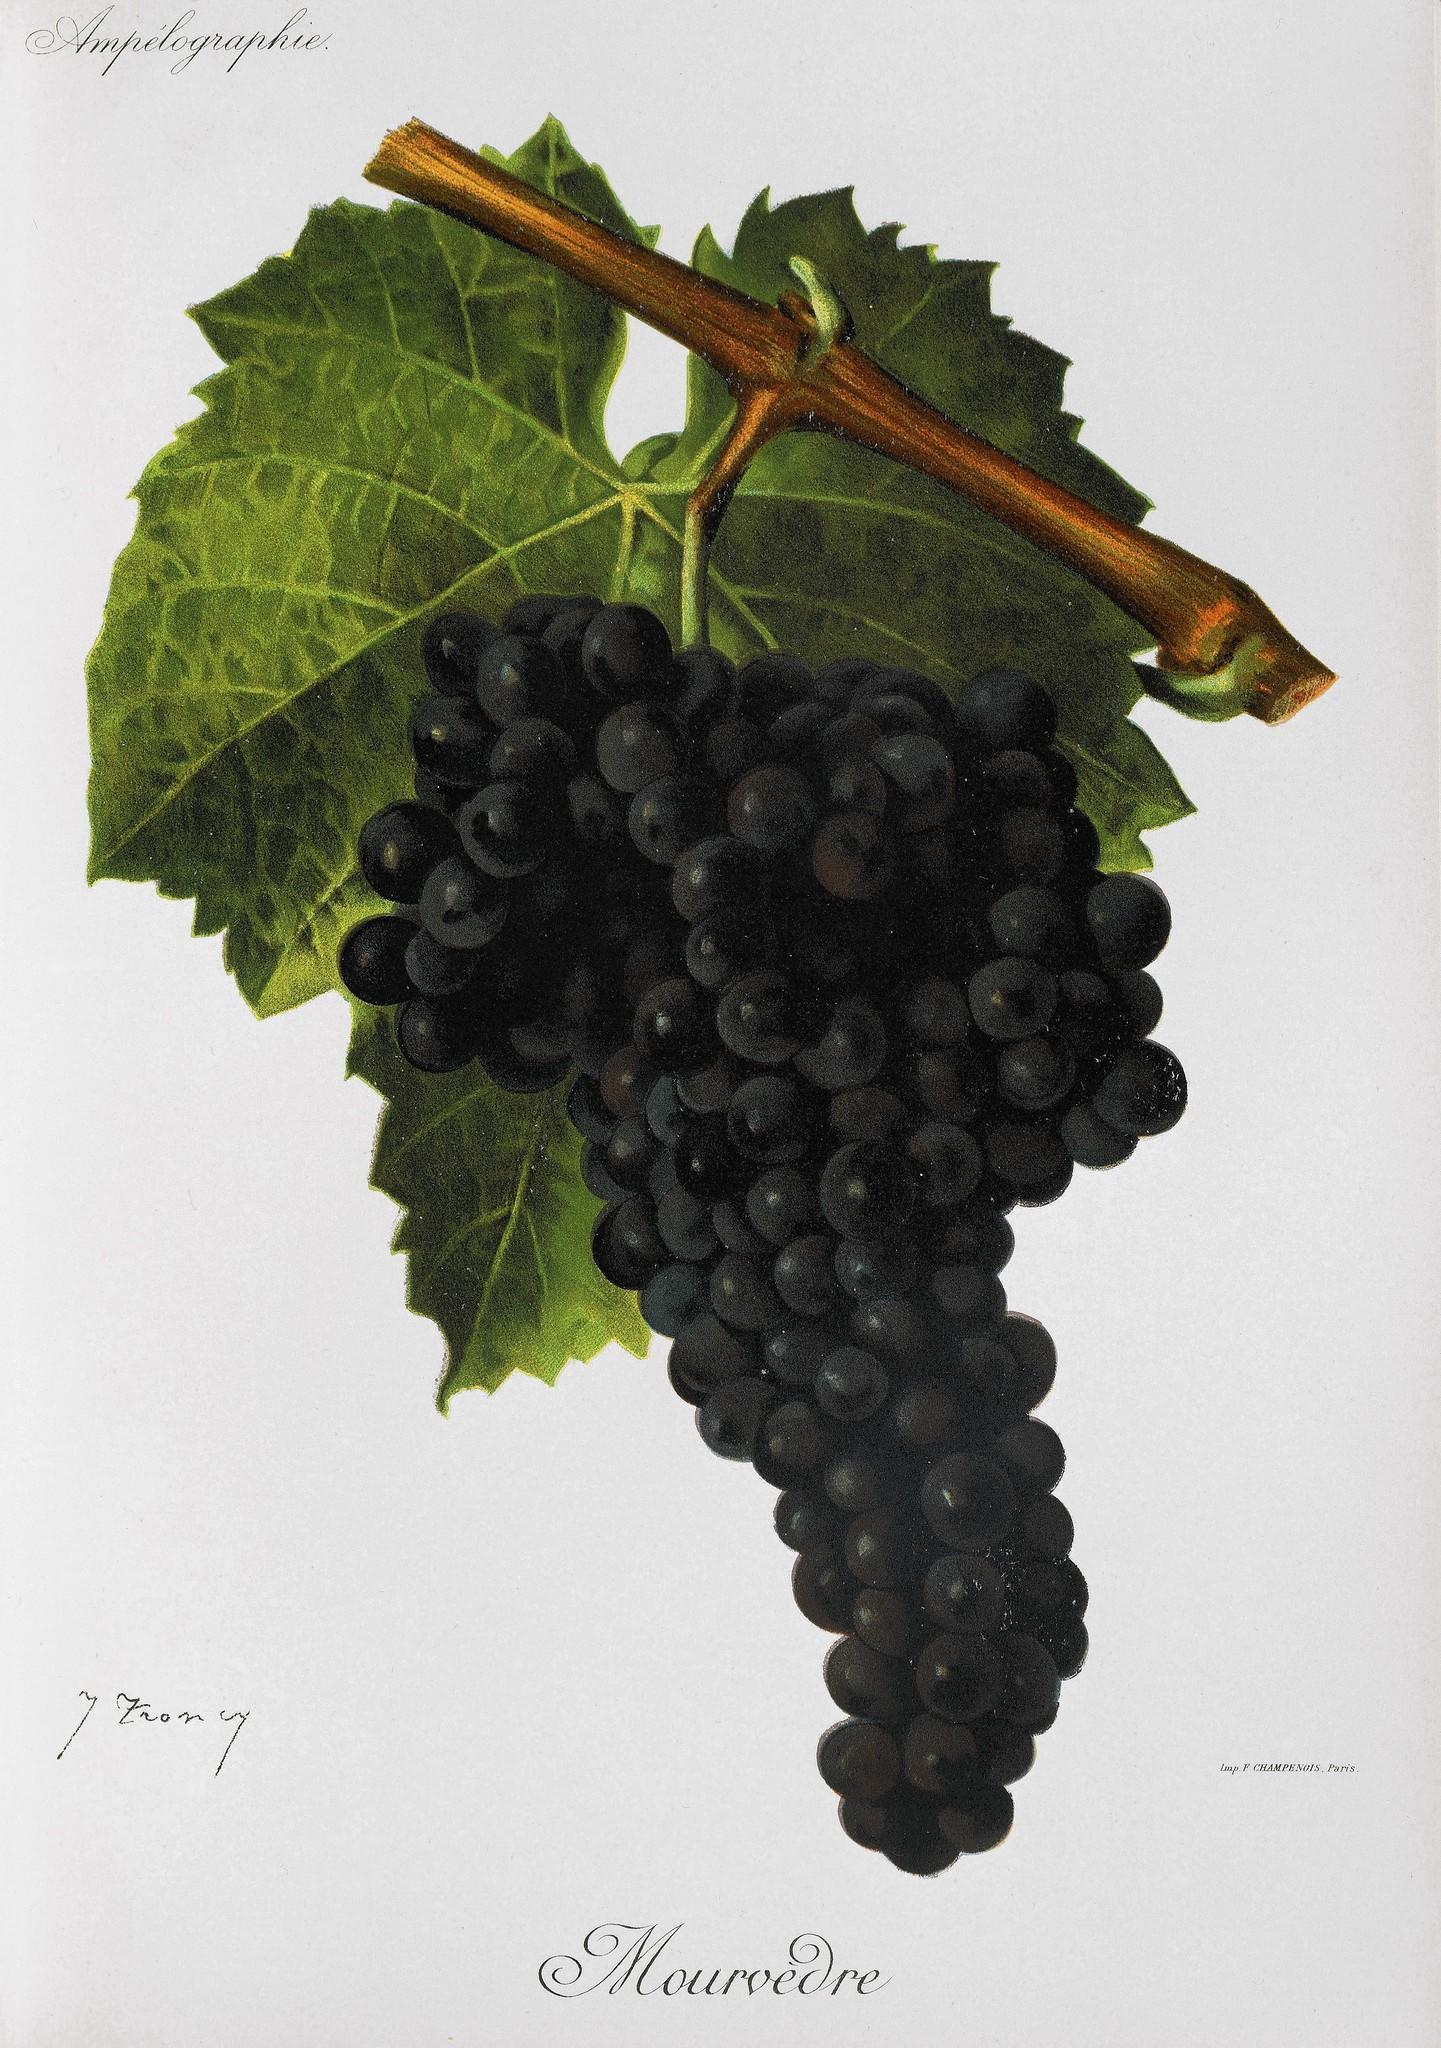 Illustration of Mourvedre grapes.